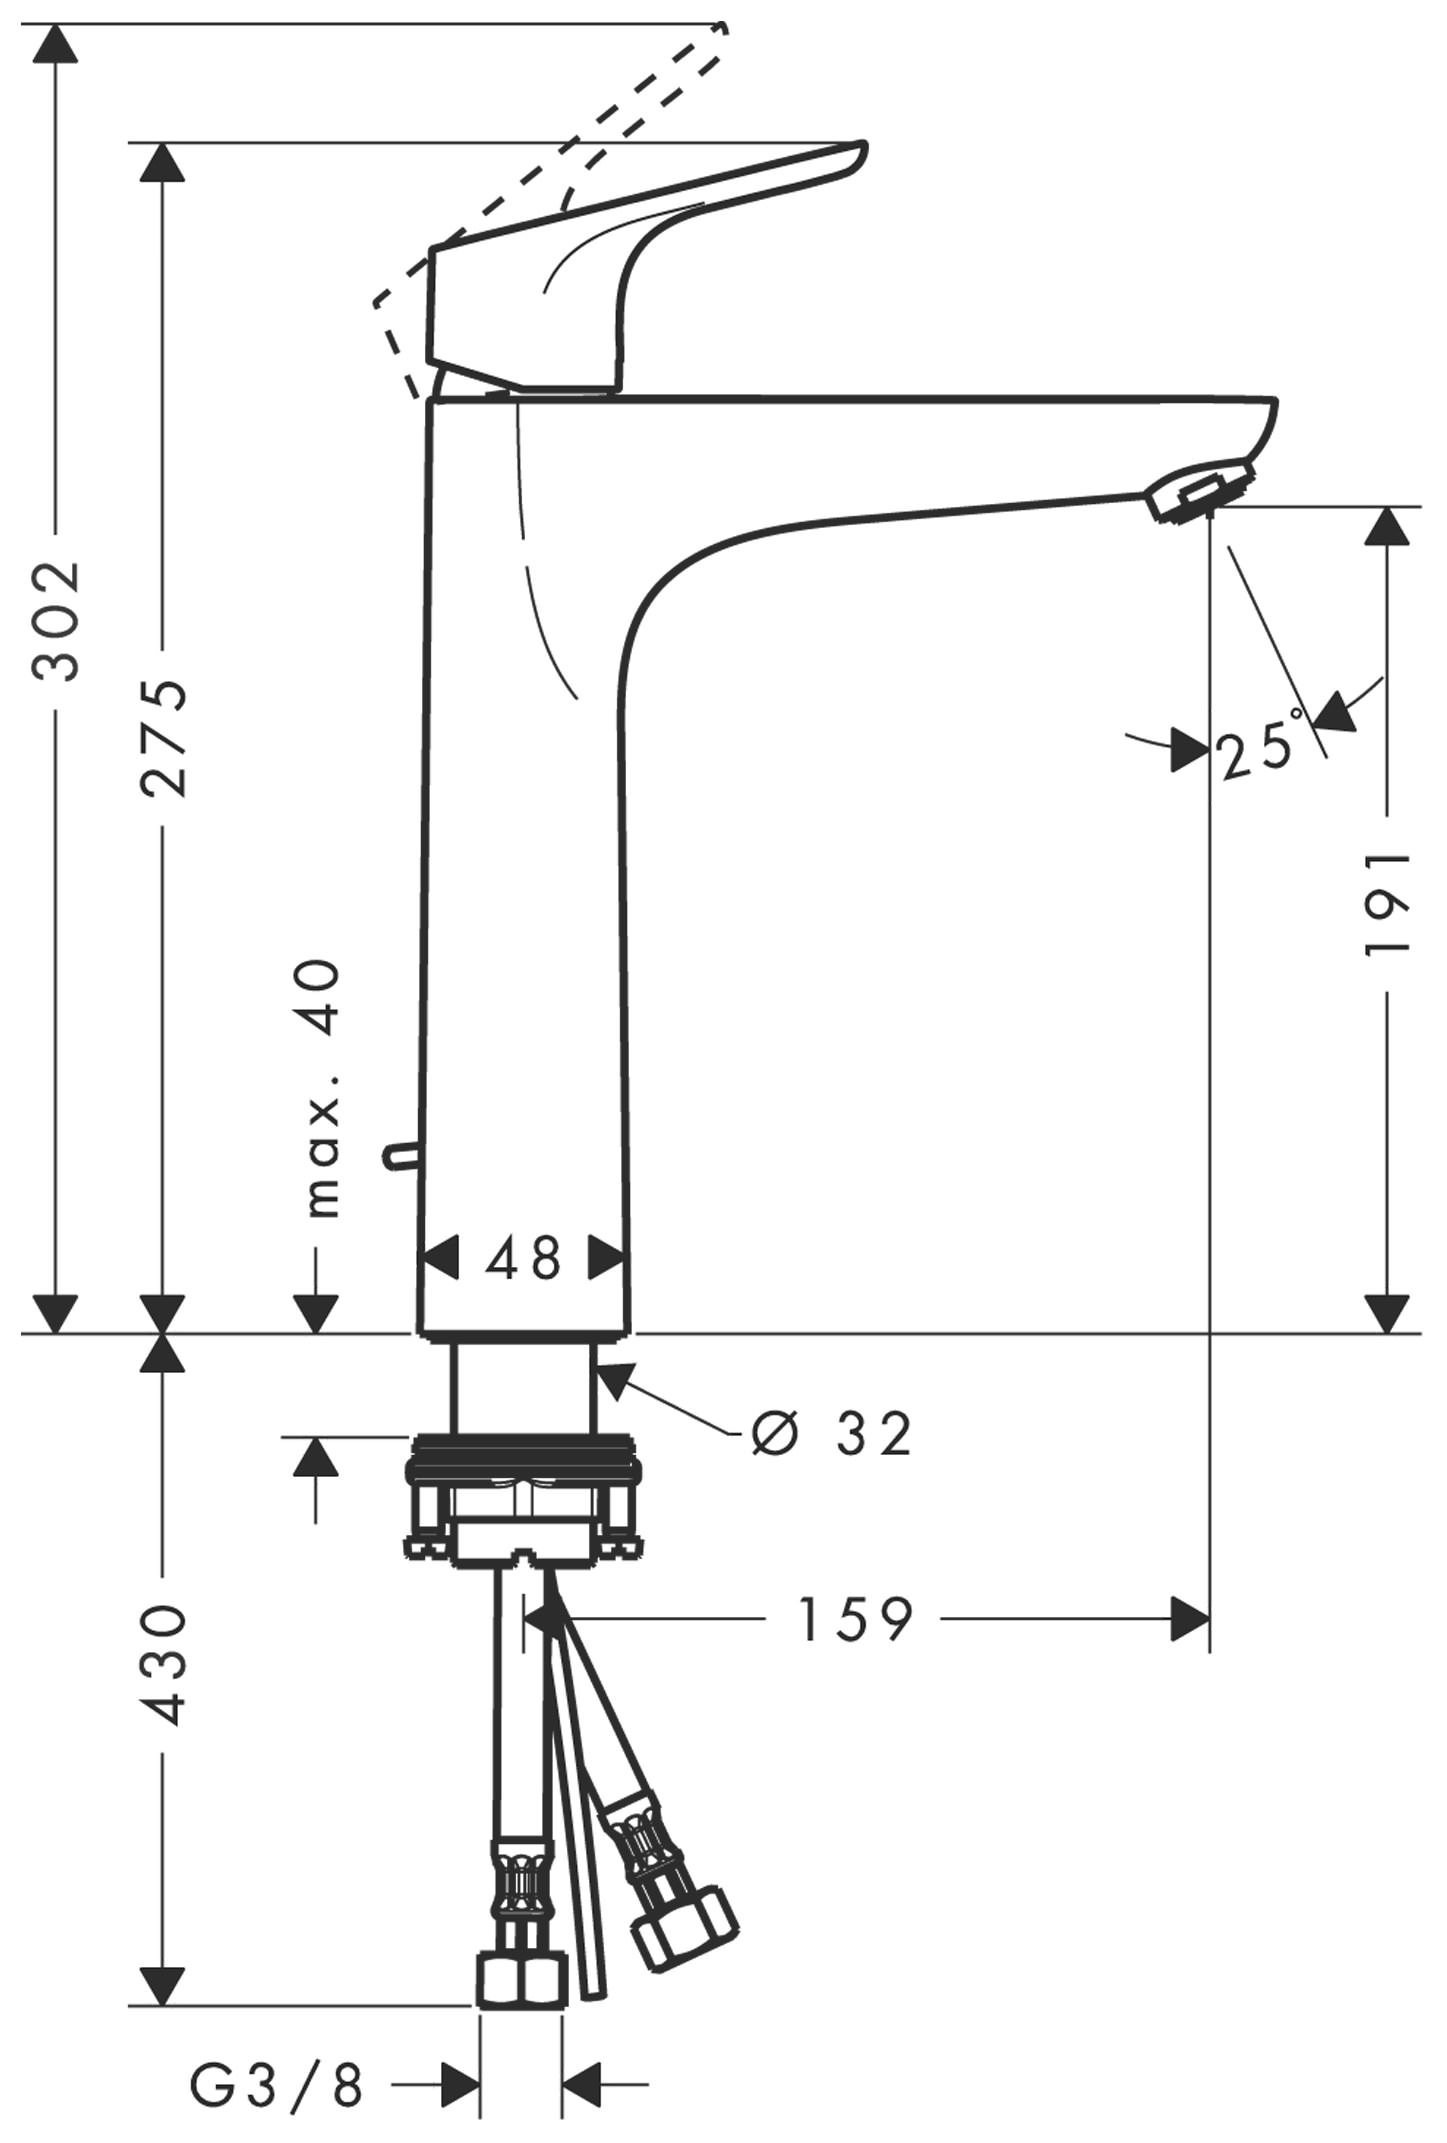 hansgrohe focus waschtischmischer 190 chrom 31608000. Black Bedroom Furniture Sets. Home Design Ideas